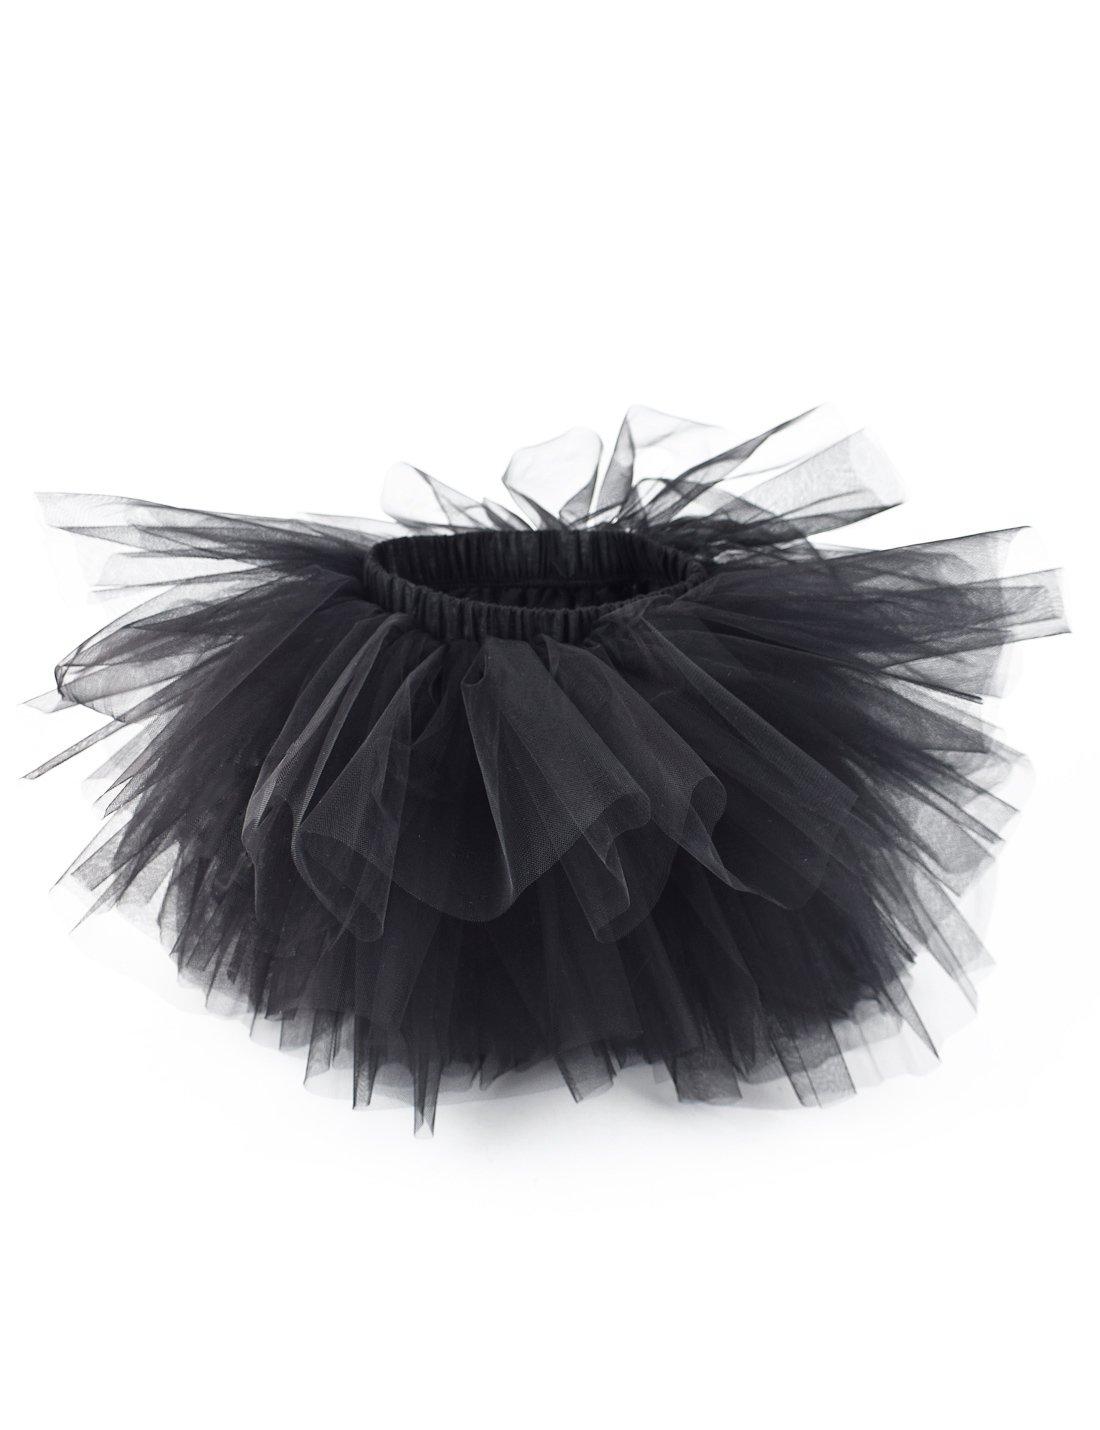 tortoiserabbit Girl's 6-Layered Ballet Tutu Fluffy Tulle Aerobarre Dancing Petticoat Puffy Skirt Black M